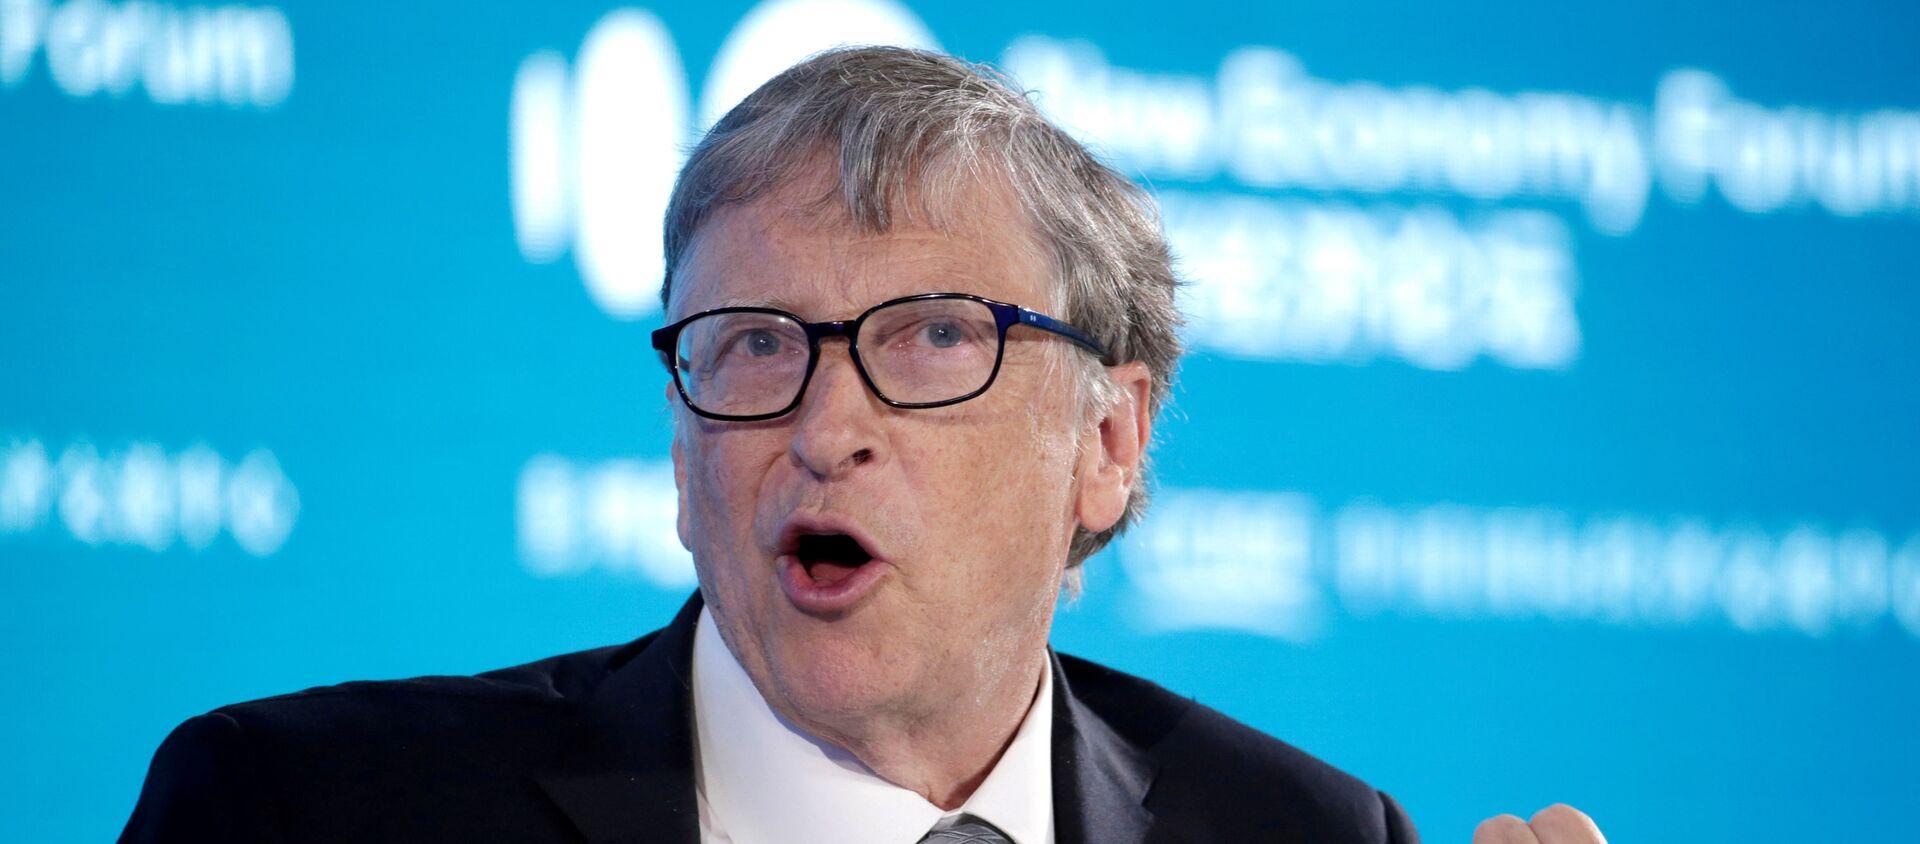 Bill Gates, Co-Chair of Bill & Melinda Gates Foundation, attends a conversation at the 2019 New Economy Forum in Beijing, China November 21, 2019 - Sputnik International, 1920, 11.02.2021